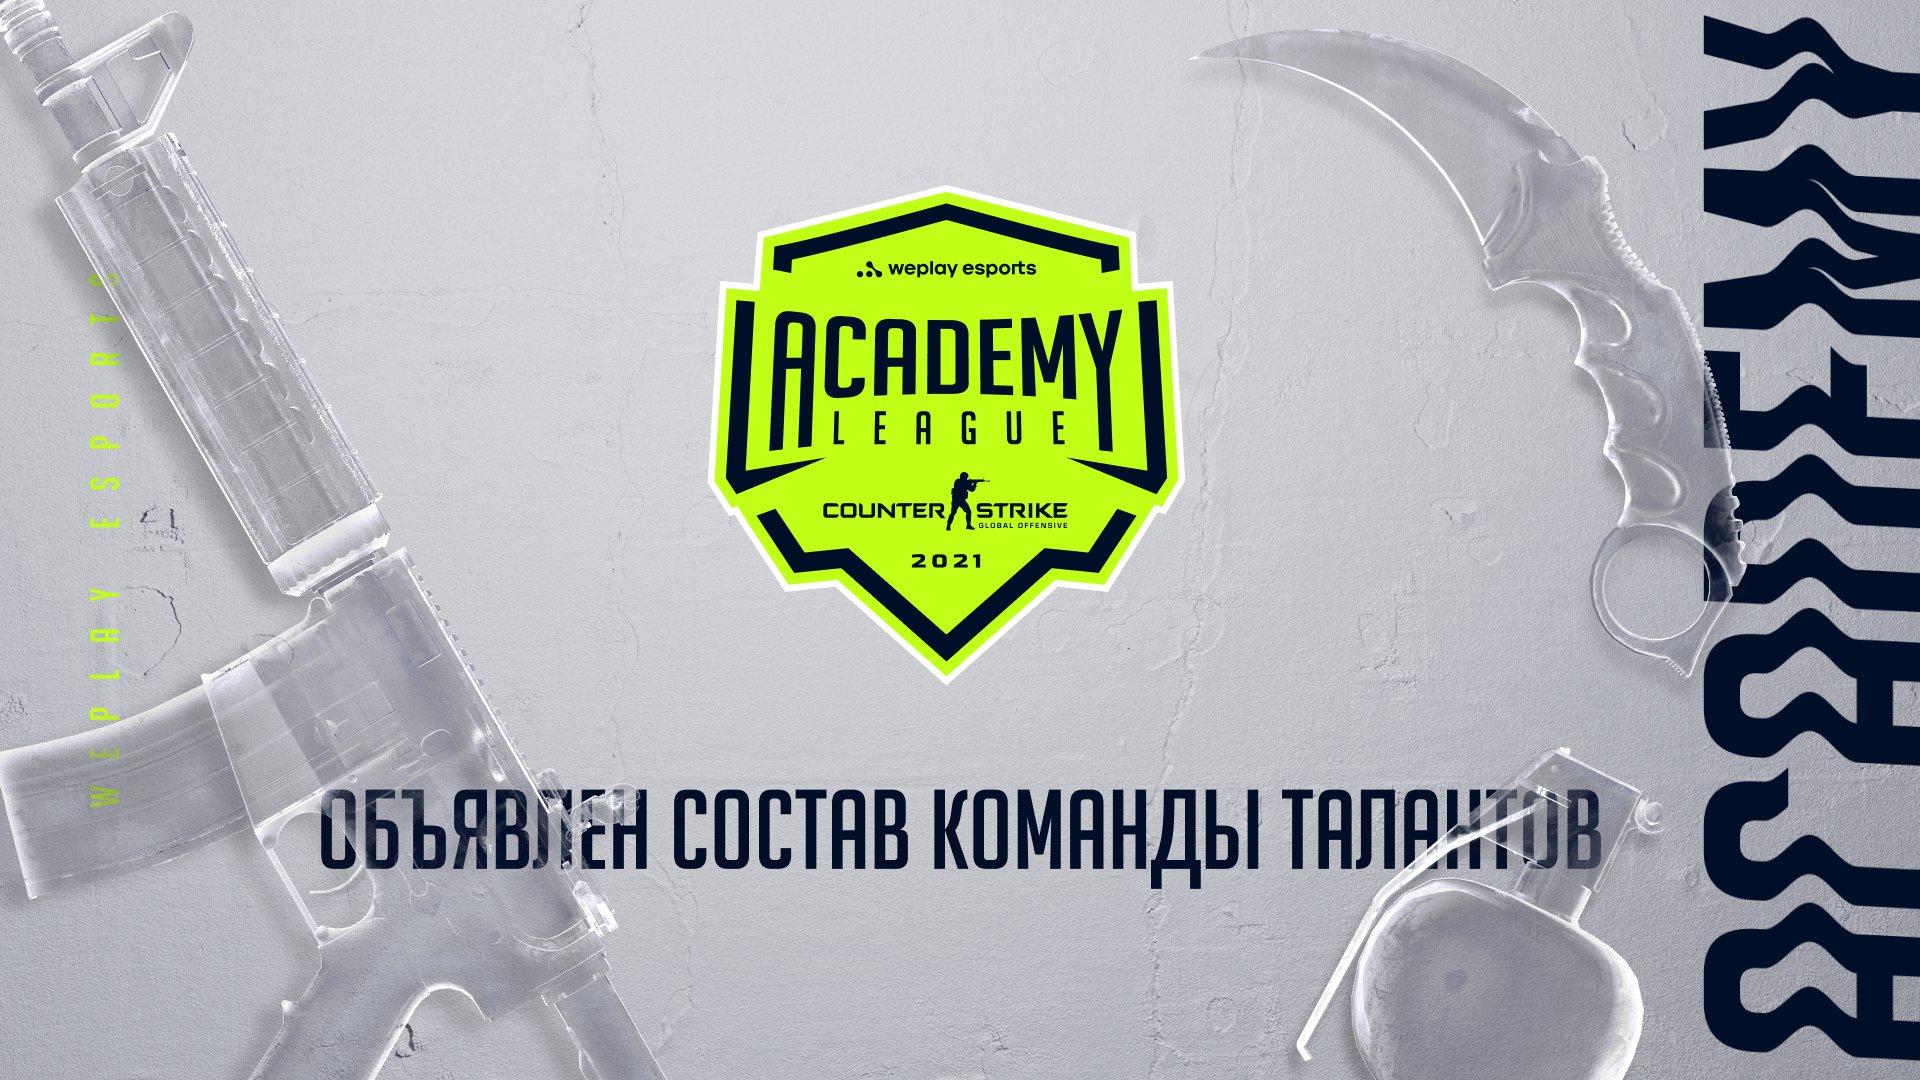 Состав команды талантов WePlay Academy League Season 1. Изображение: WePlay Holding